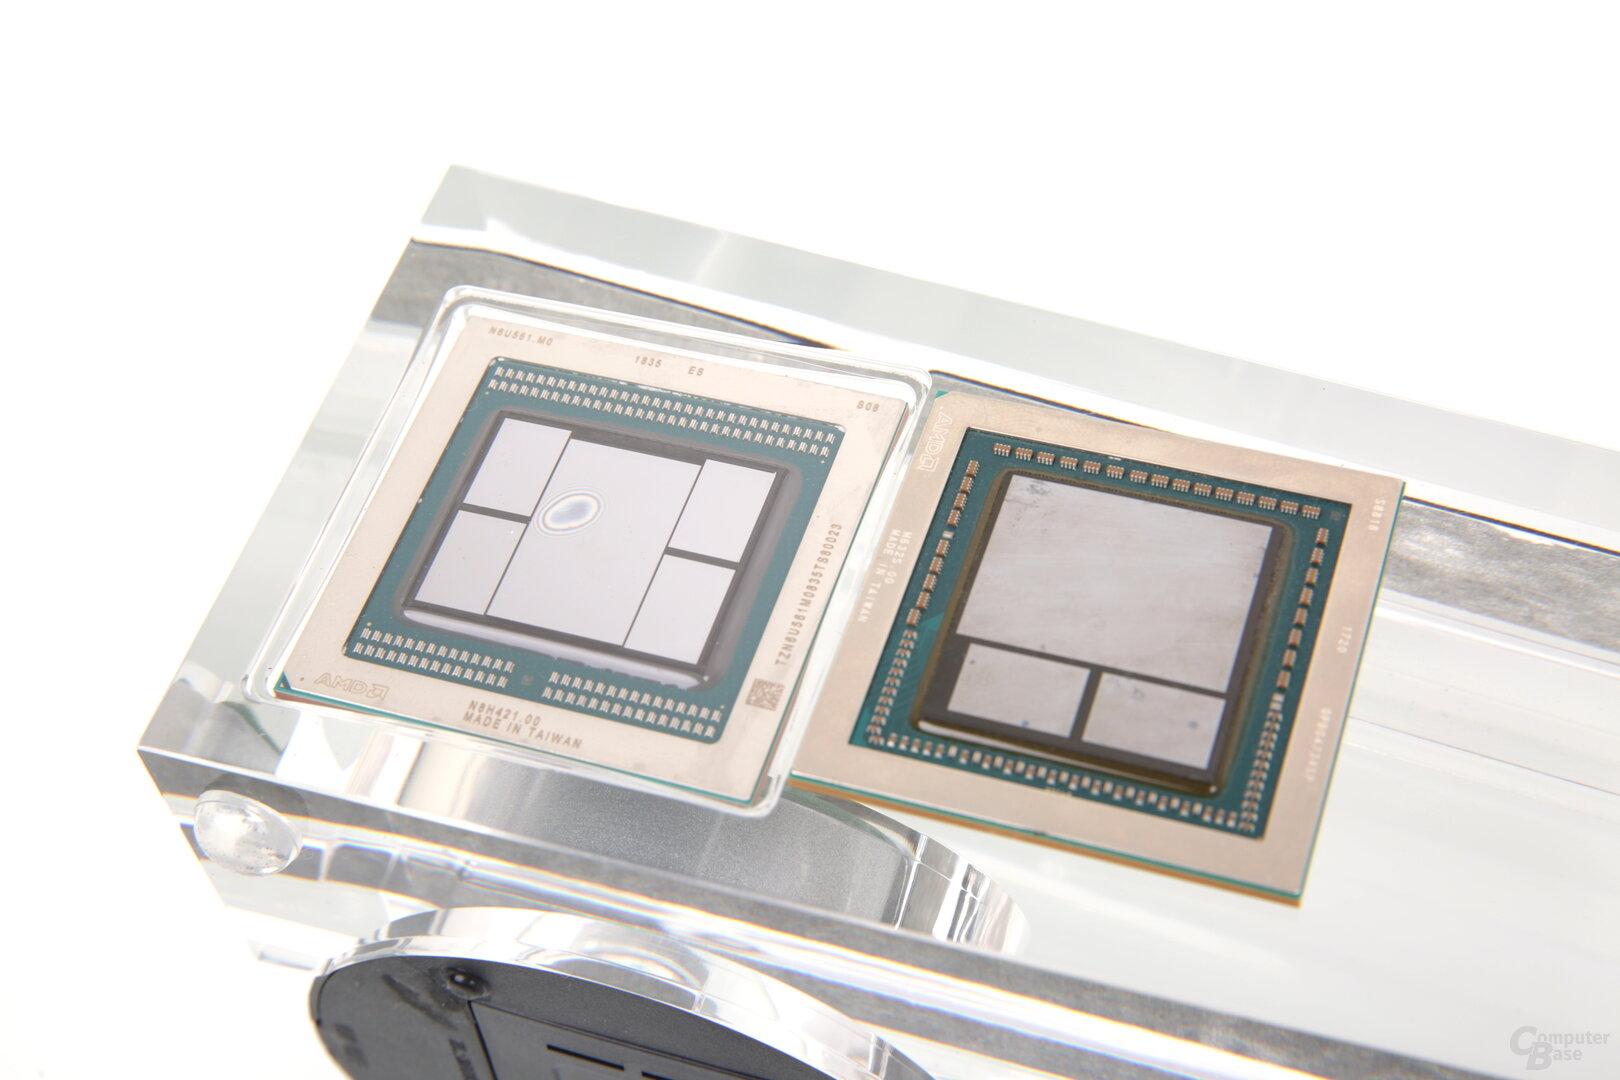 Vega 20 (links) und Vega 10 (rechts)